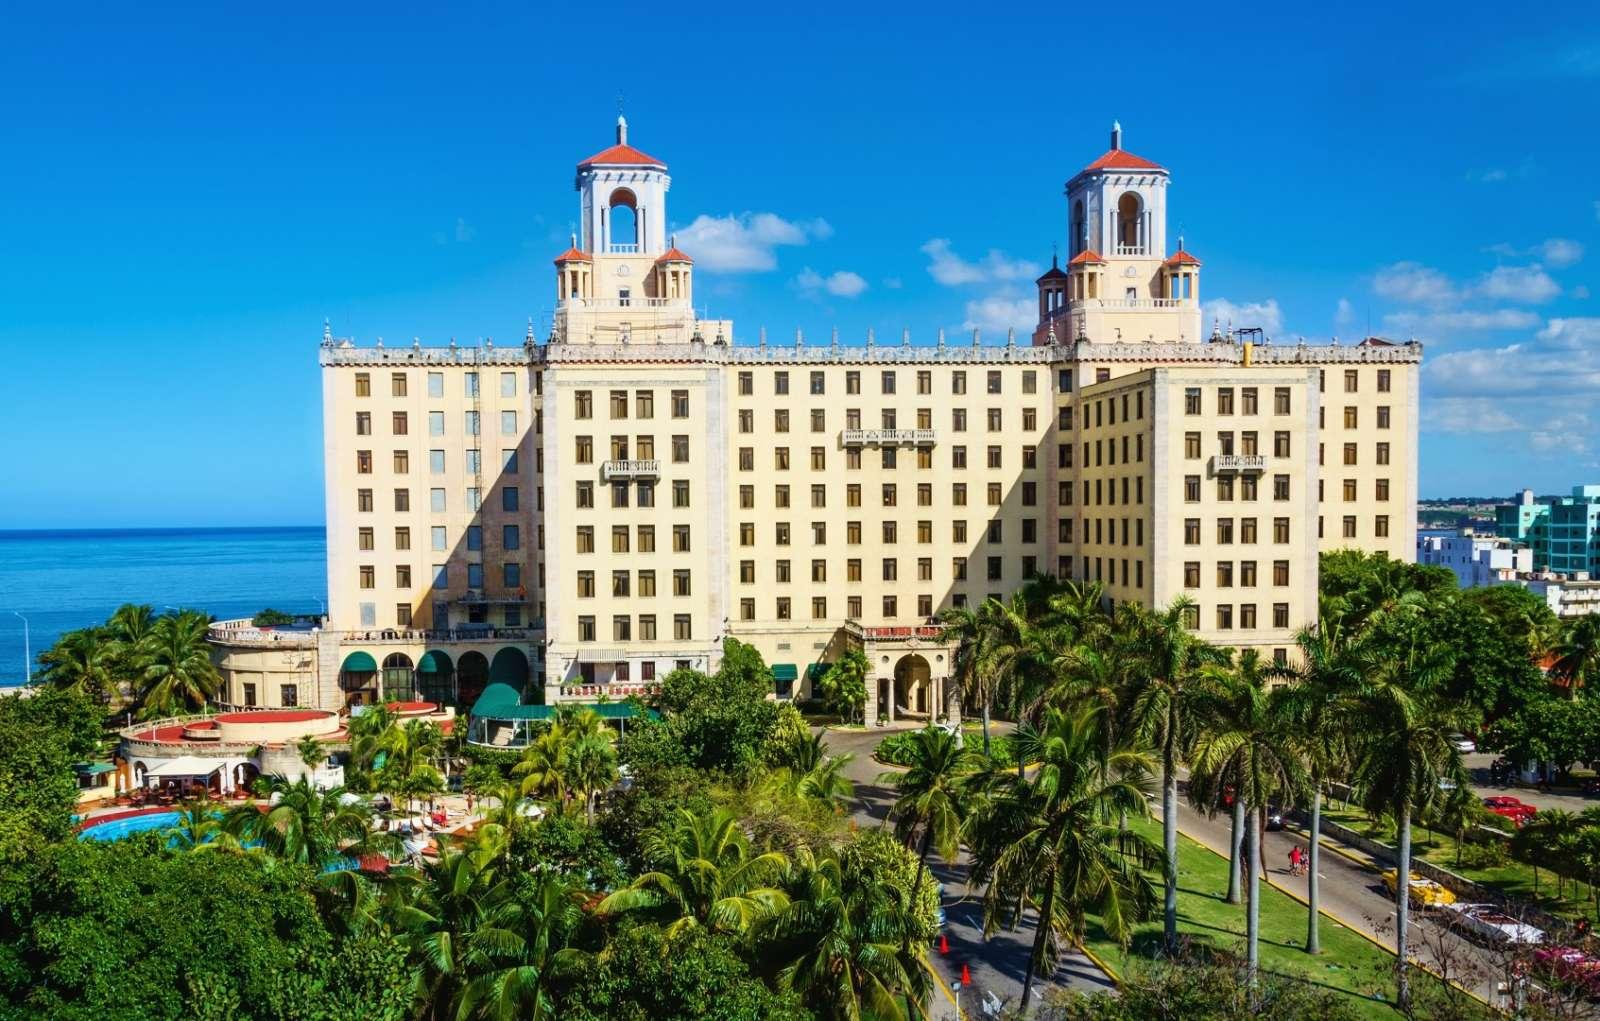 Aerial view of the Hotel Nacional in Havana, Cuba